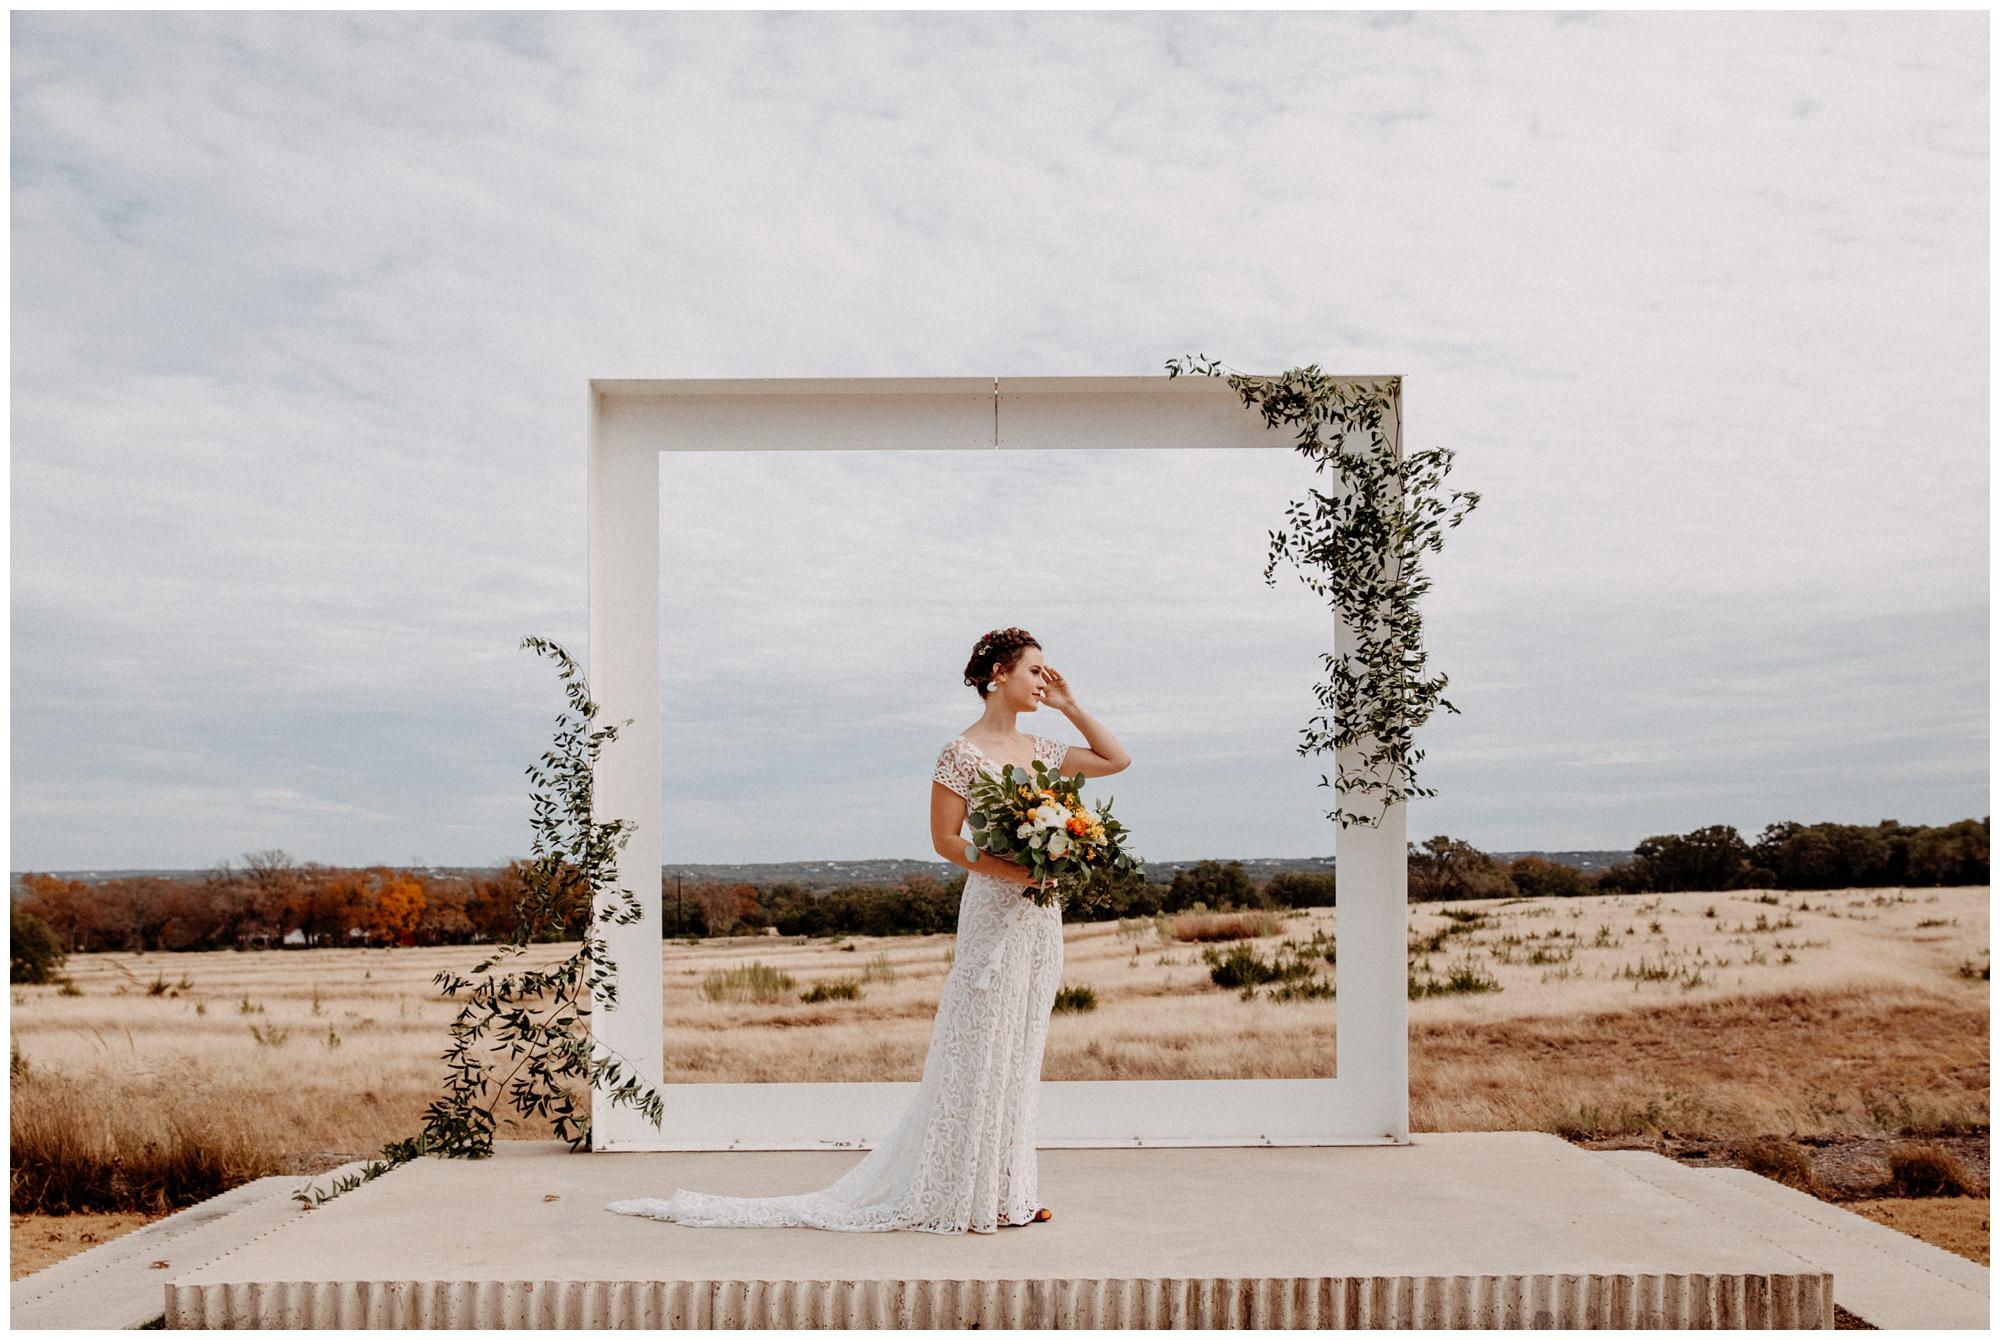 AUSTIN-TEXAS-PROSPECT-HOUSE-WEDDING-VENUE-PHOTOGRAPHY25759.JPG